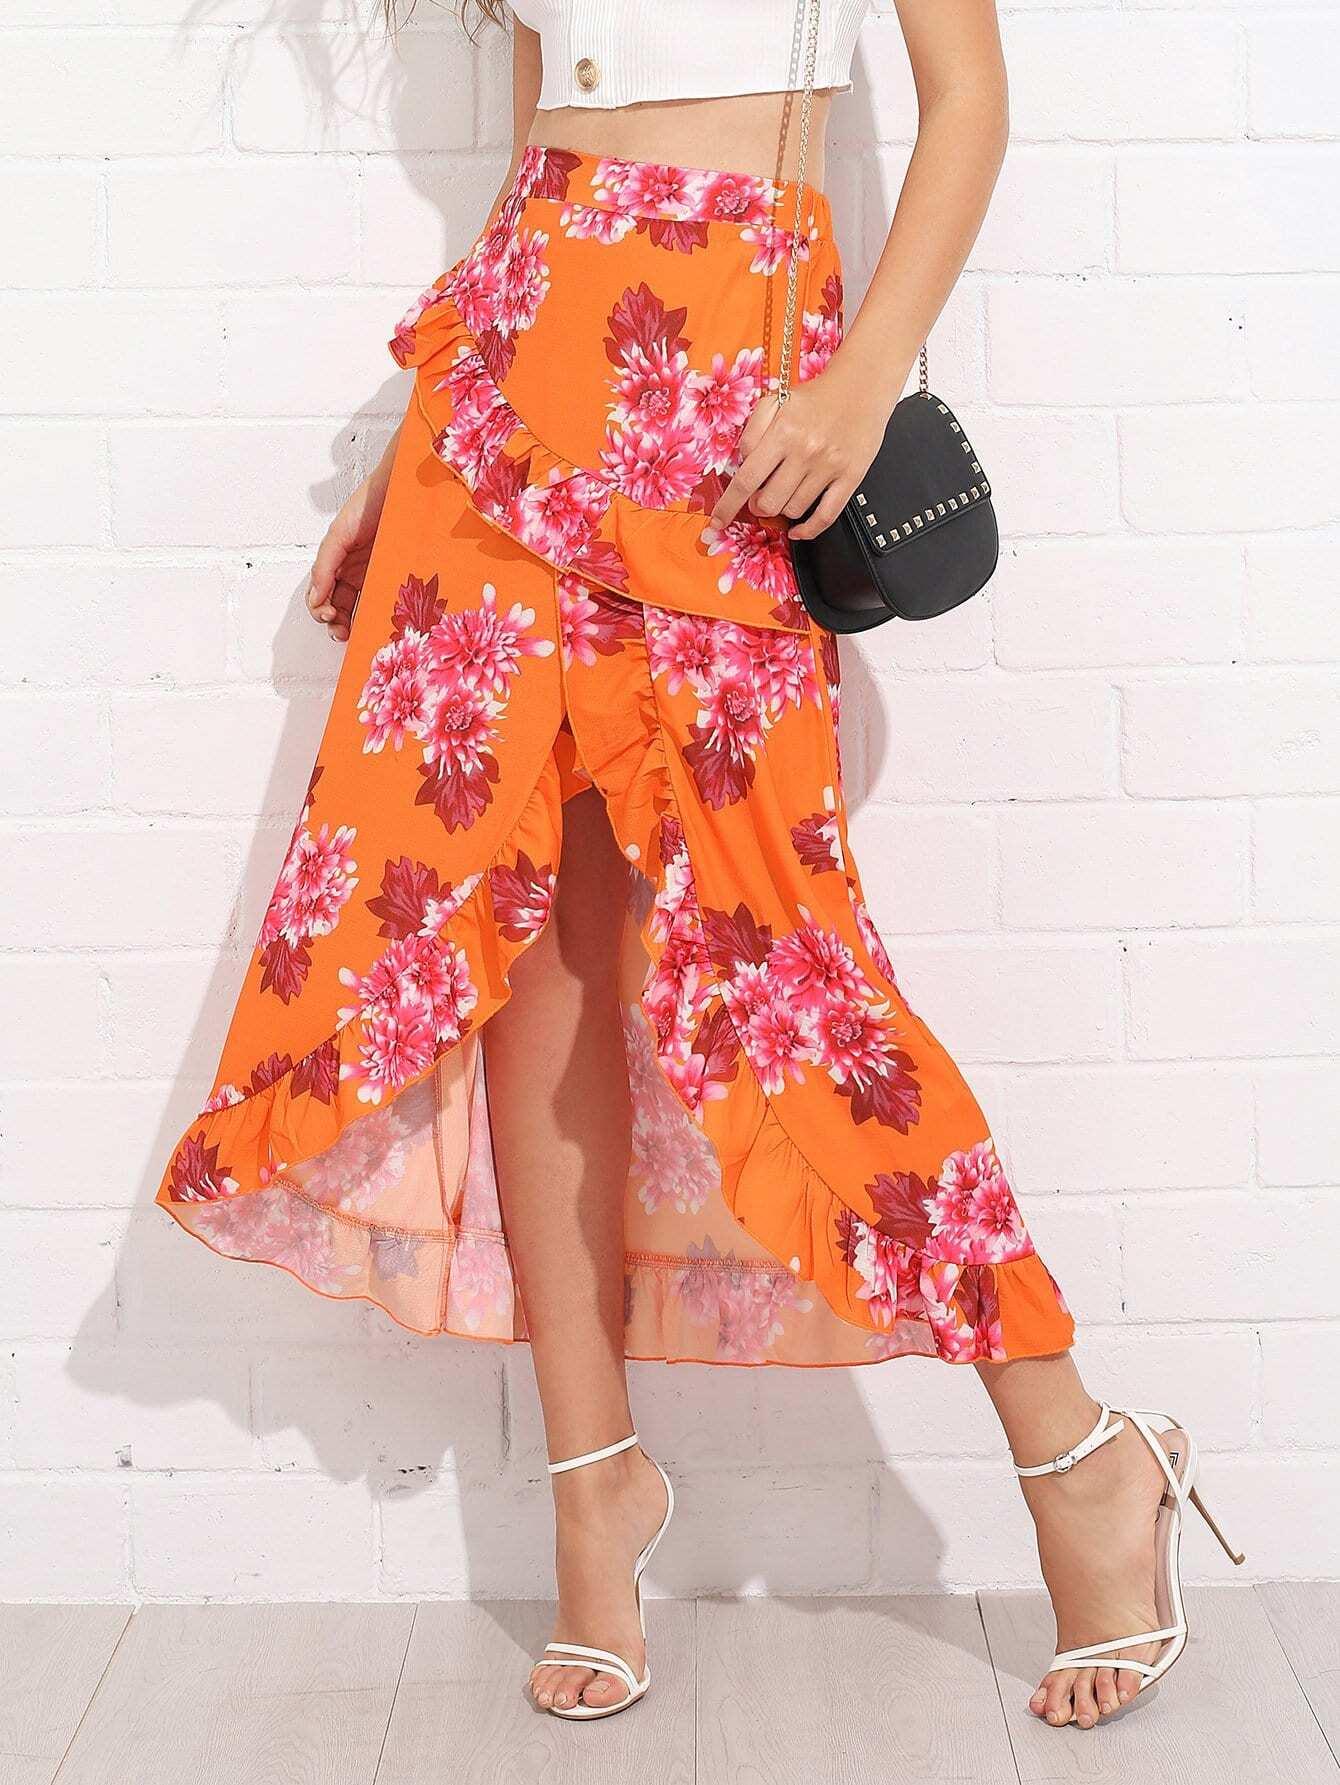 Asymmetrical Ruffle Trim Floral Skirt asymmetrical ruffle trim floral skirt